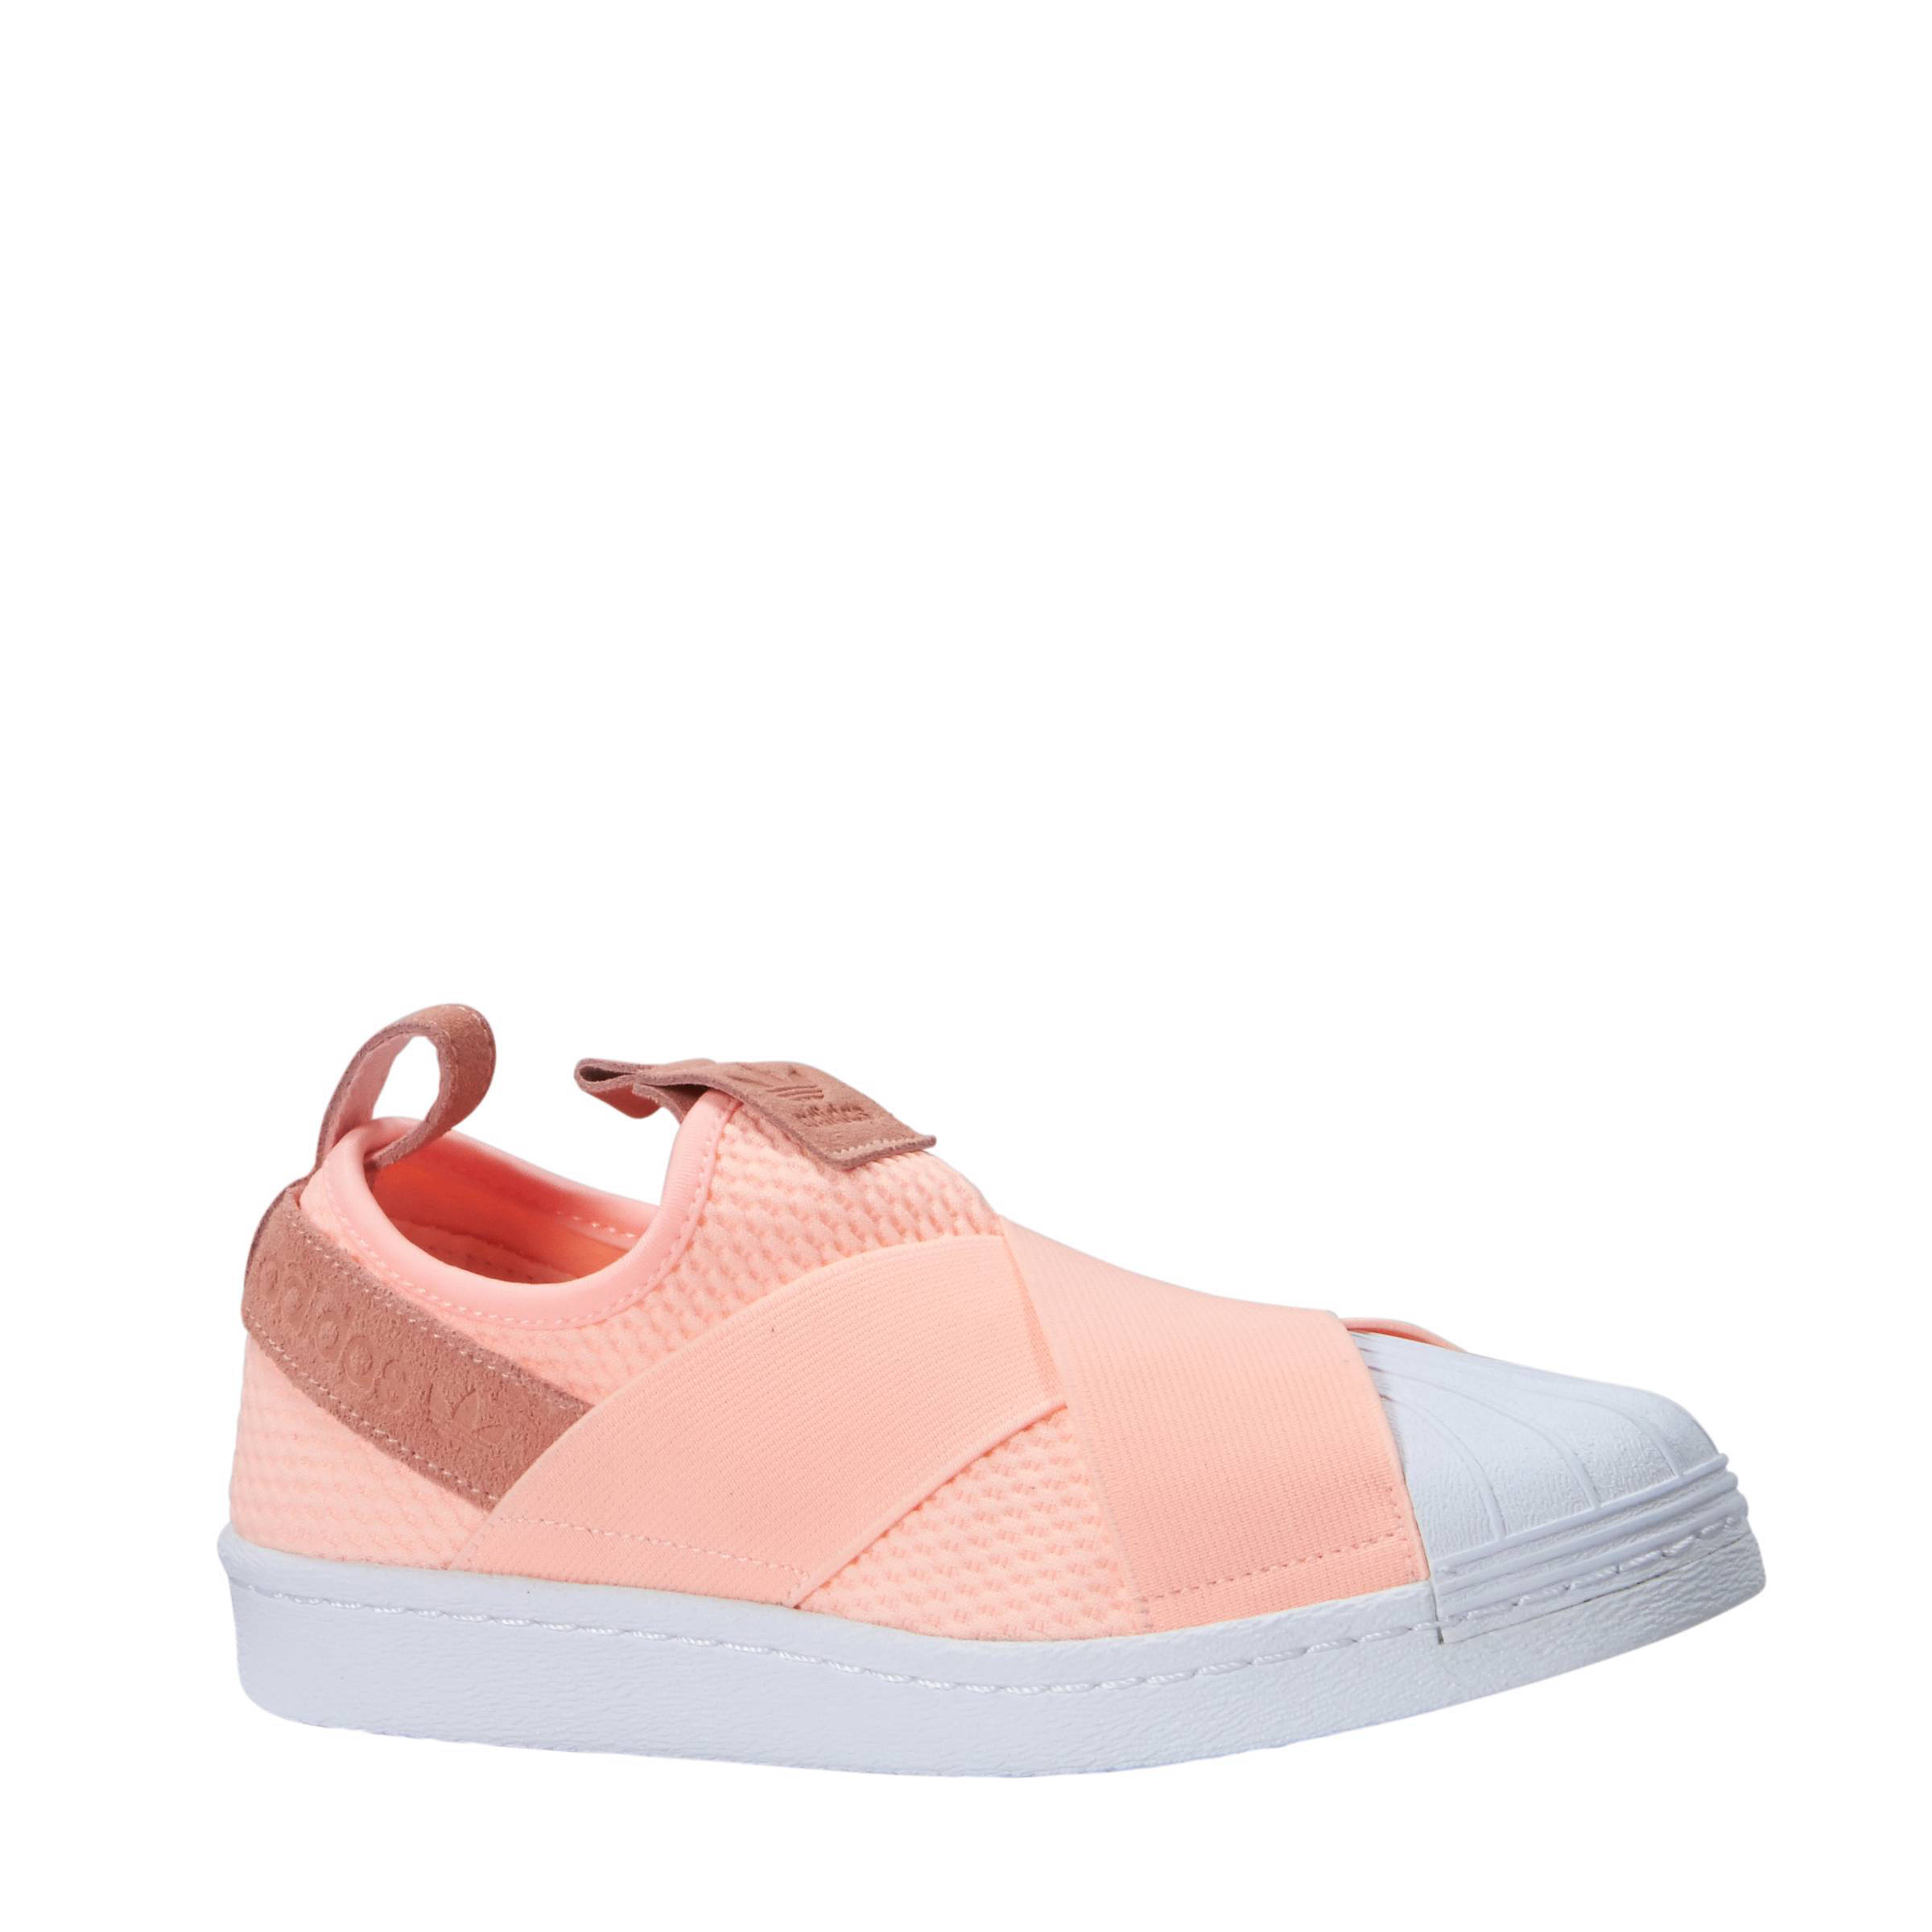 adidas superstar roze wehkamp